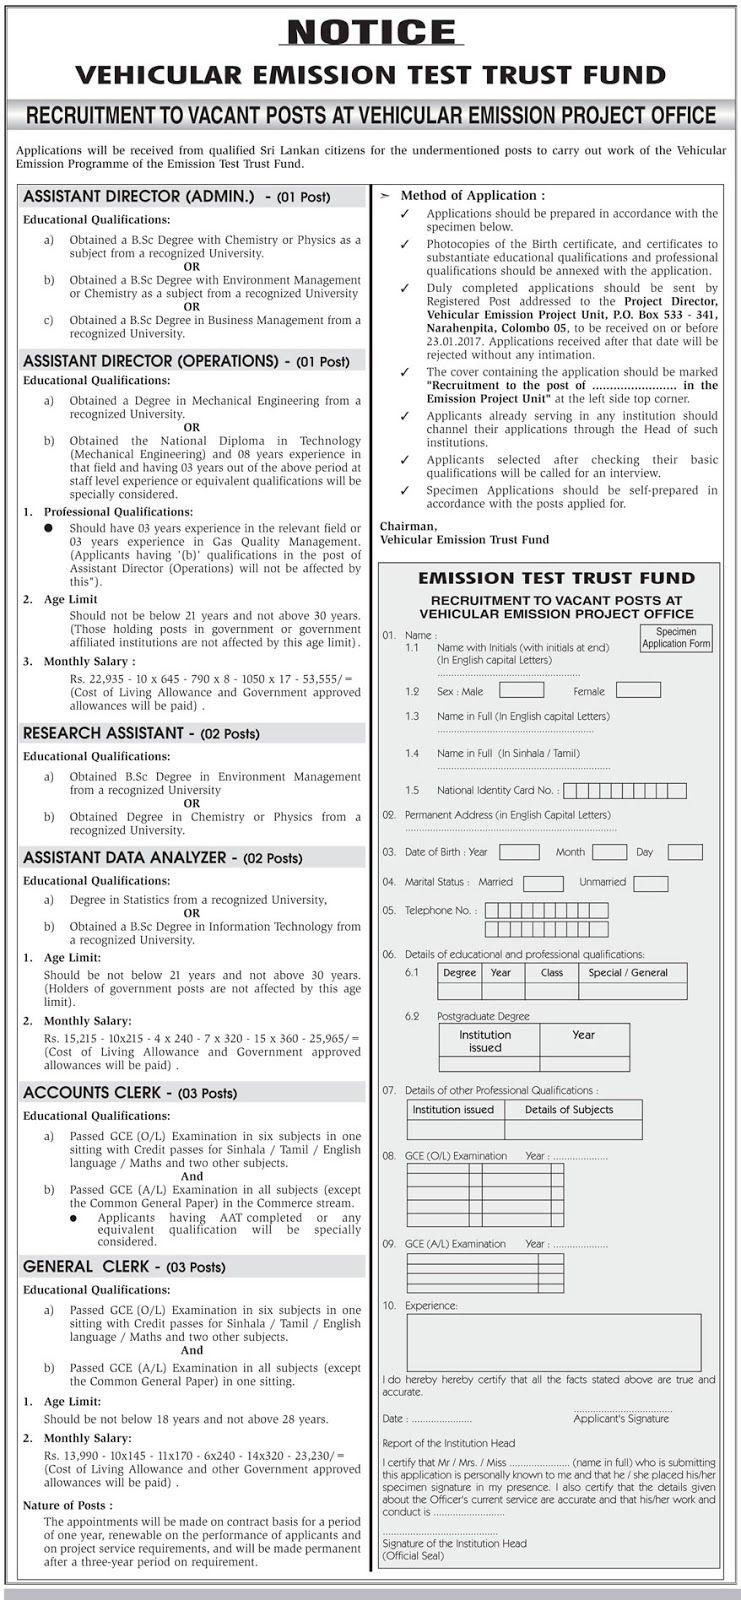 Sri Lankan Government Job Vacancies at Vehicular Emission